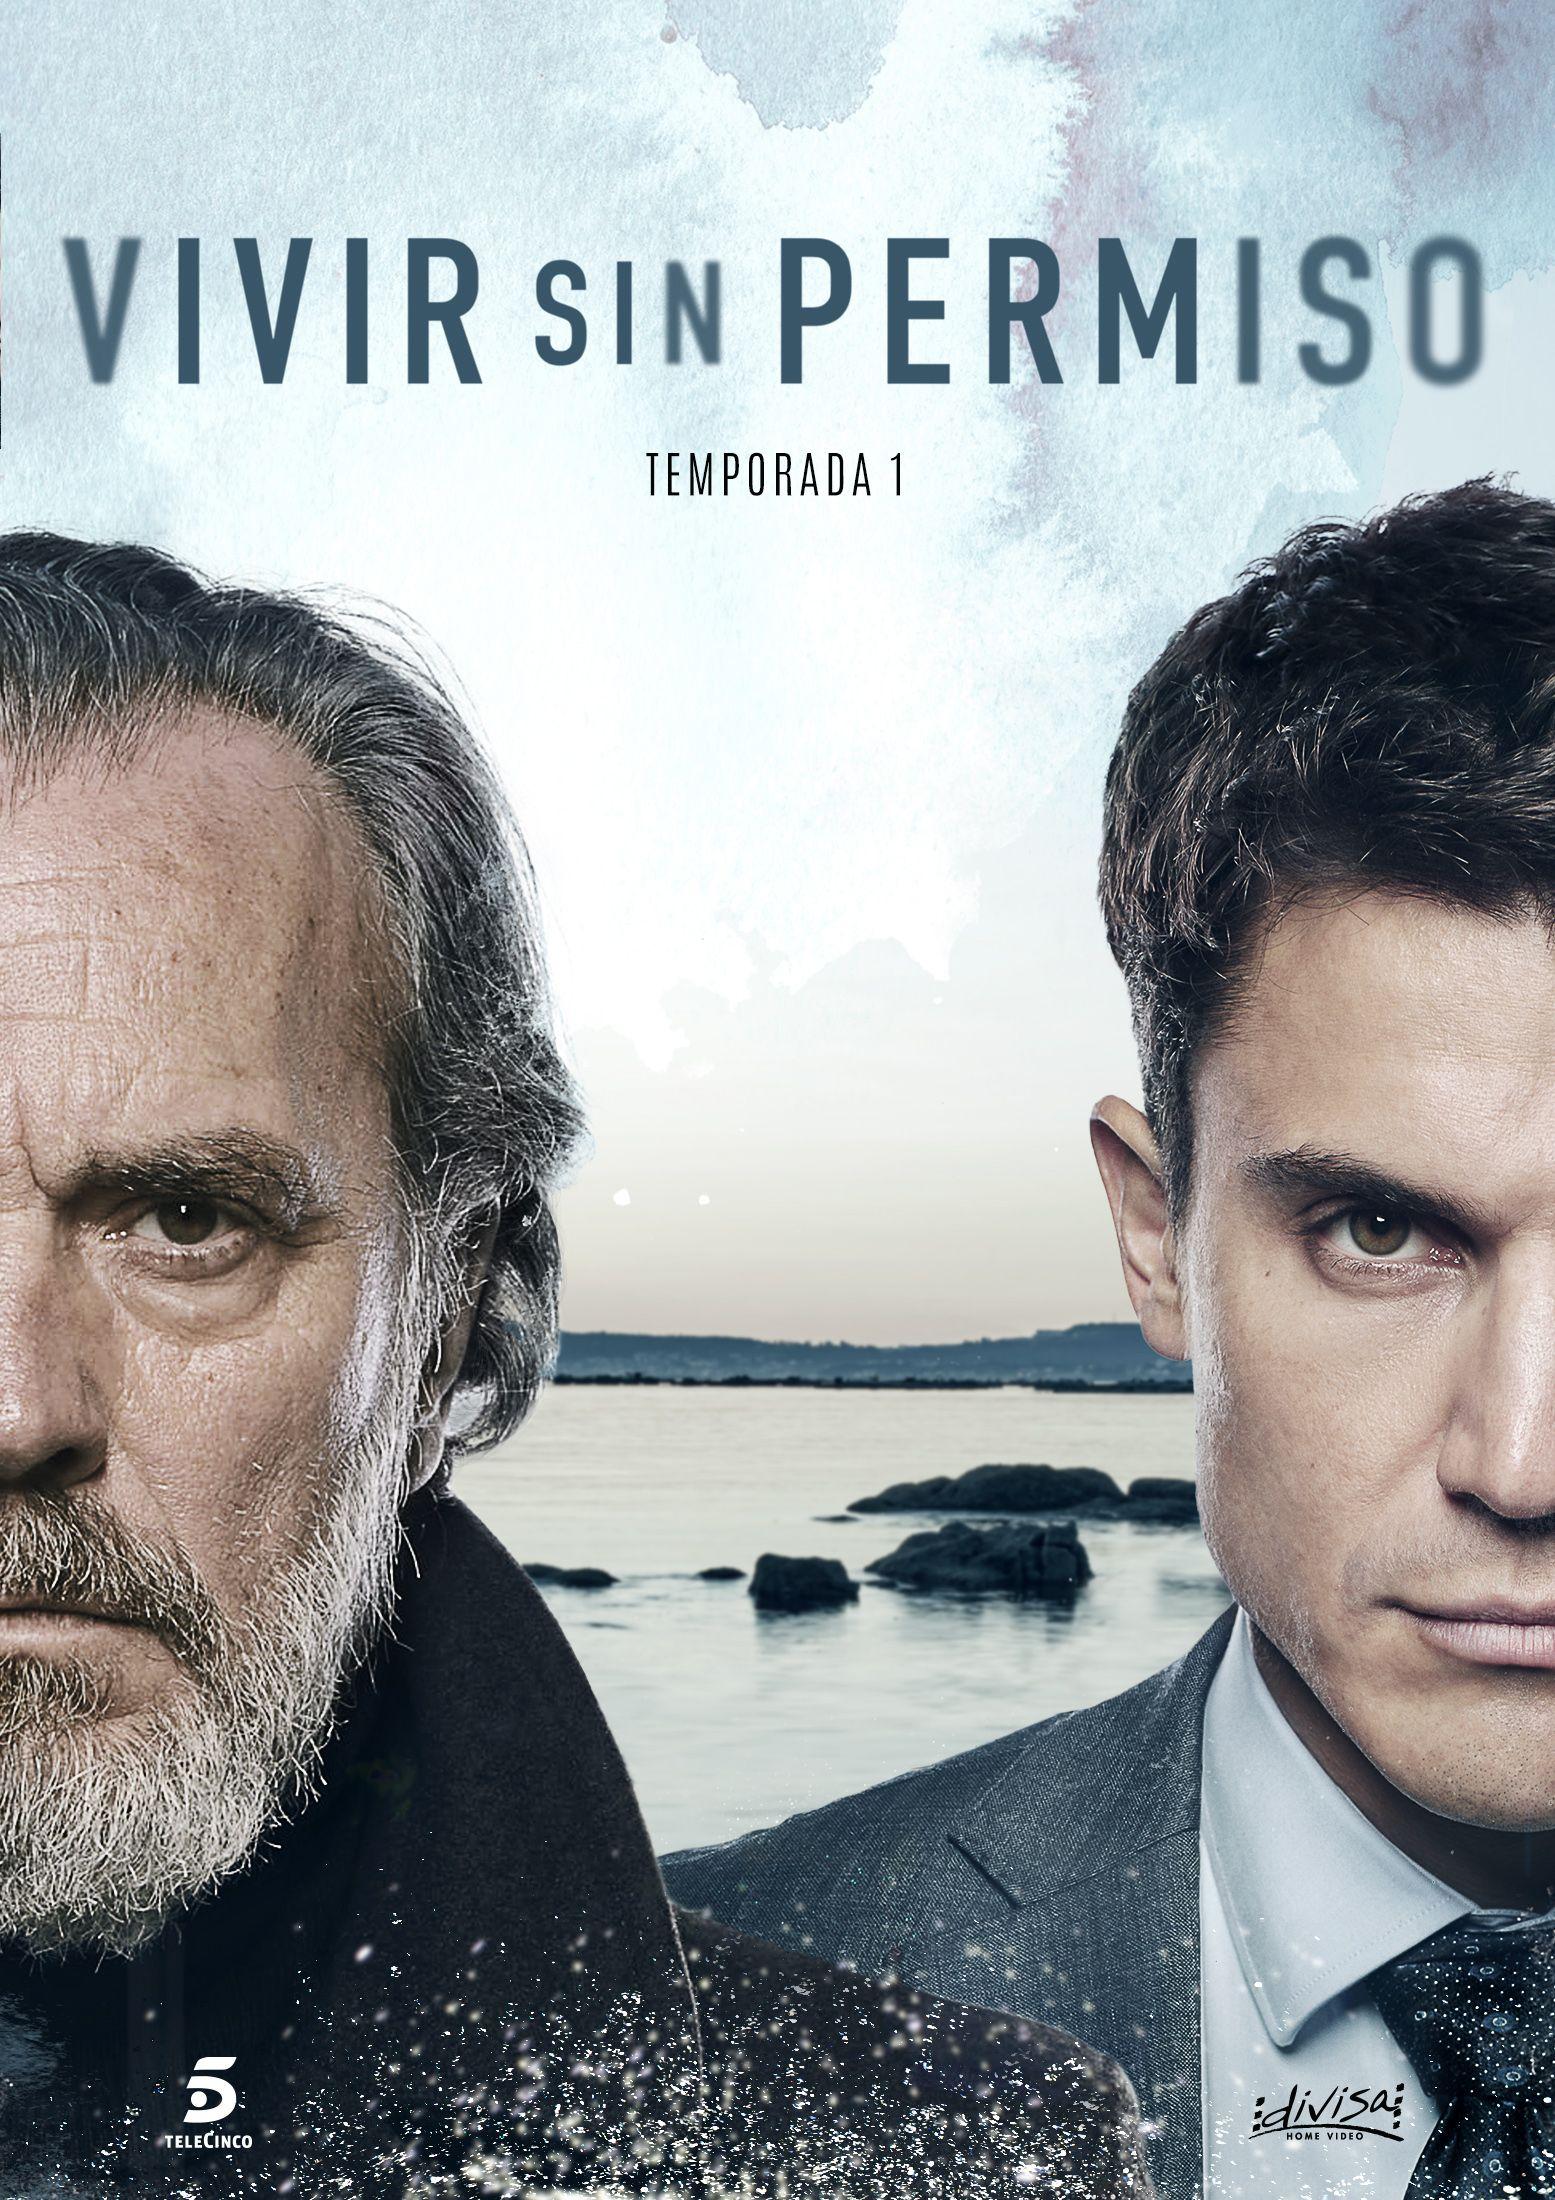 vivir sin permiso - dvd - temporada 1-8421394552340